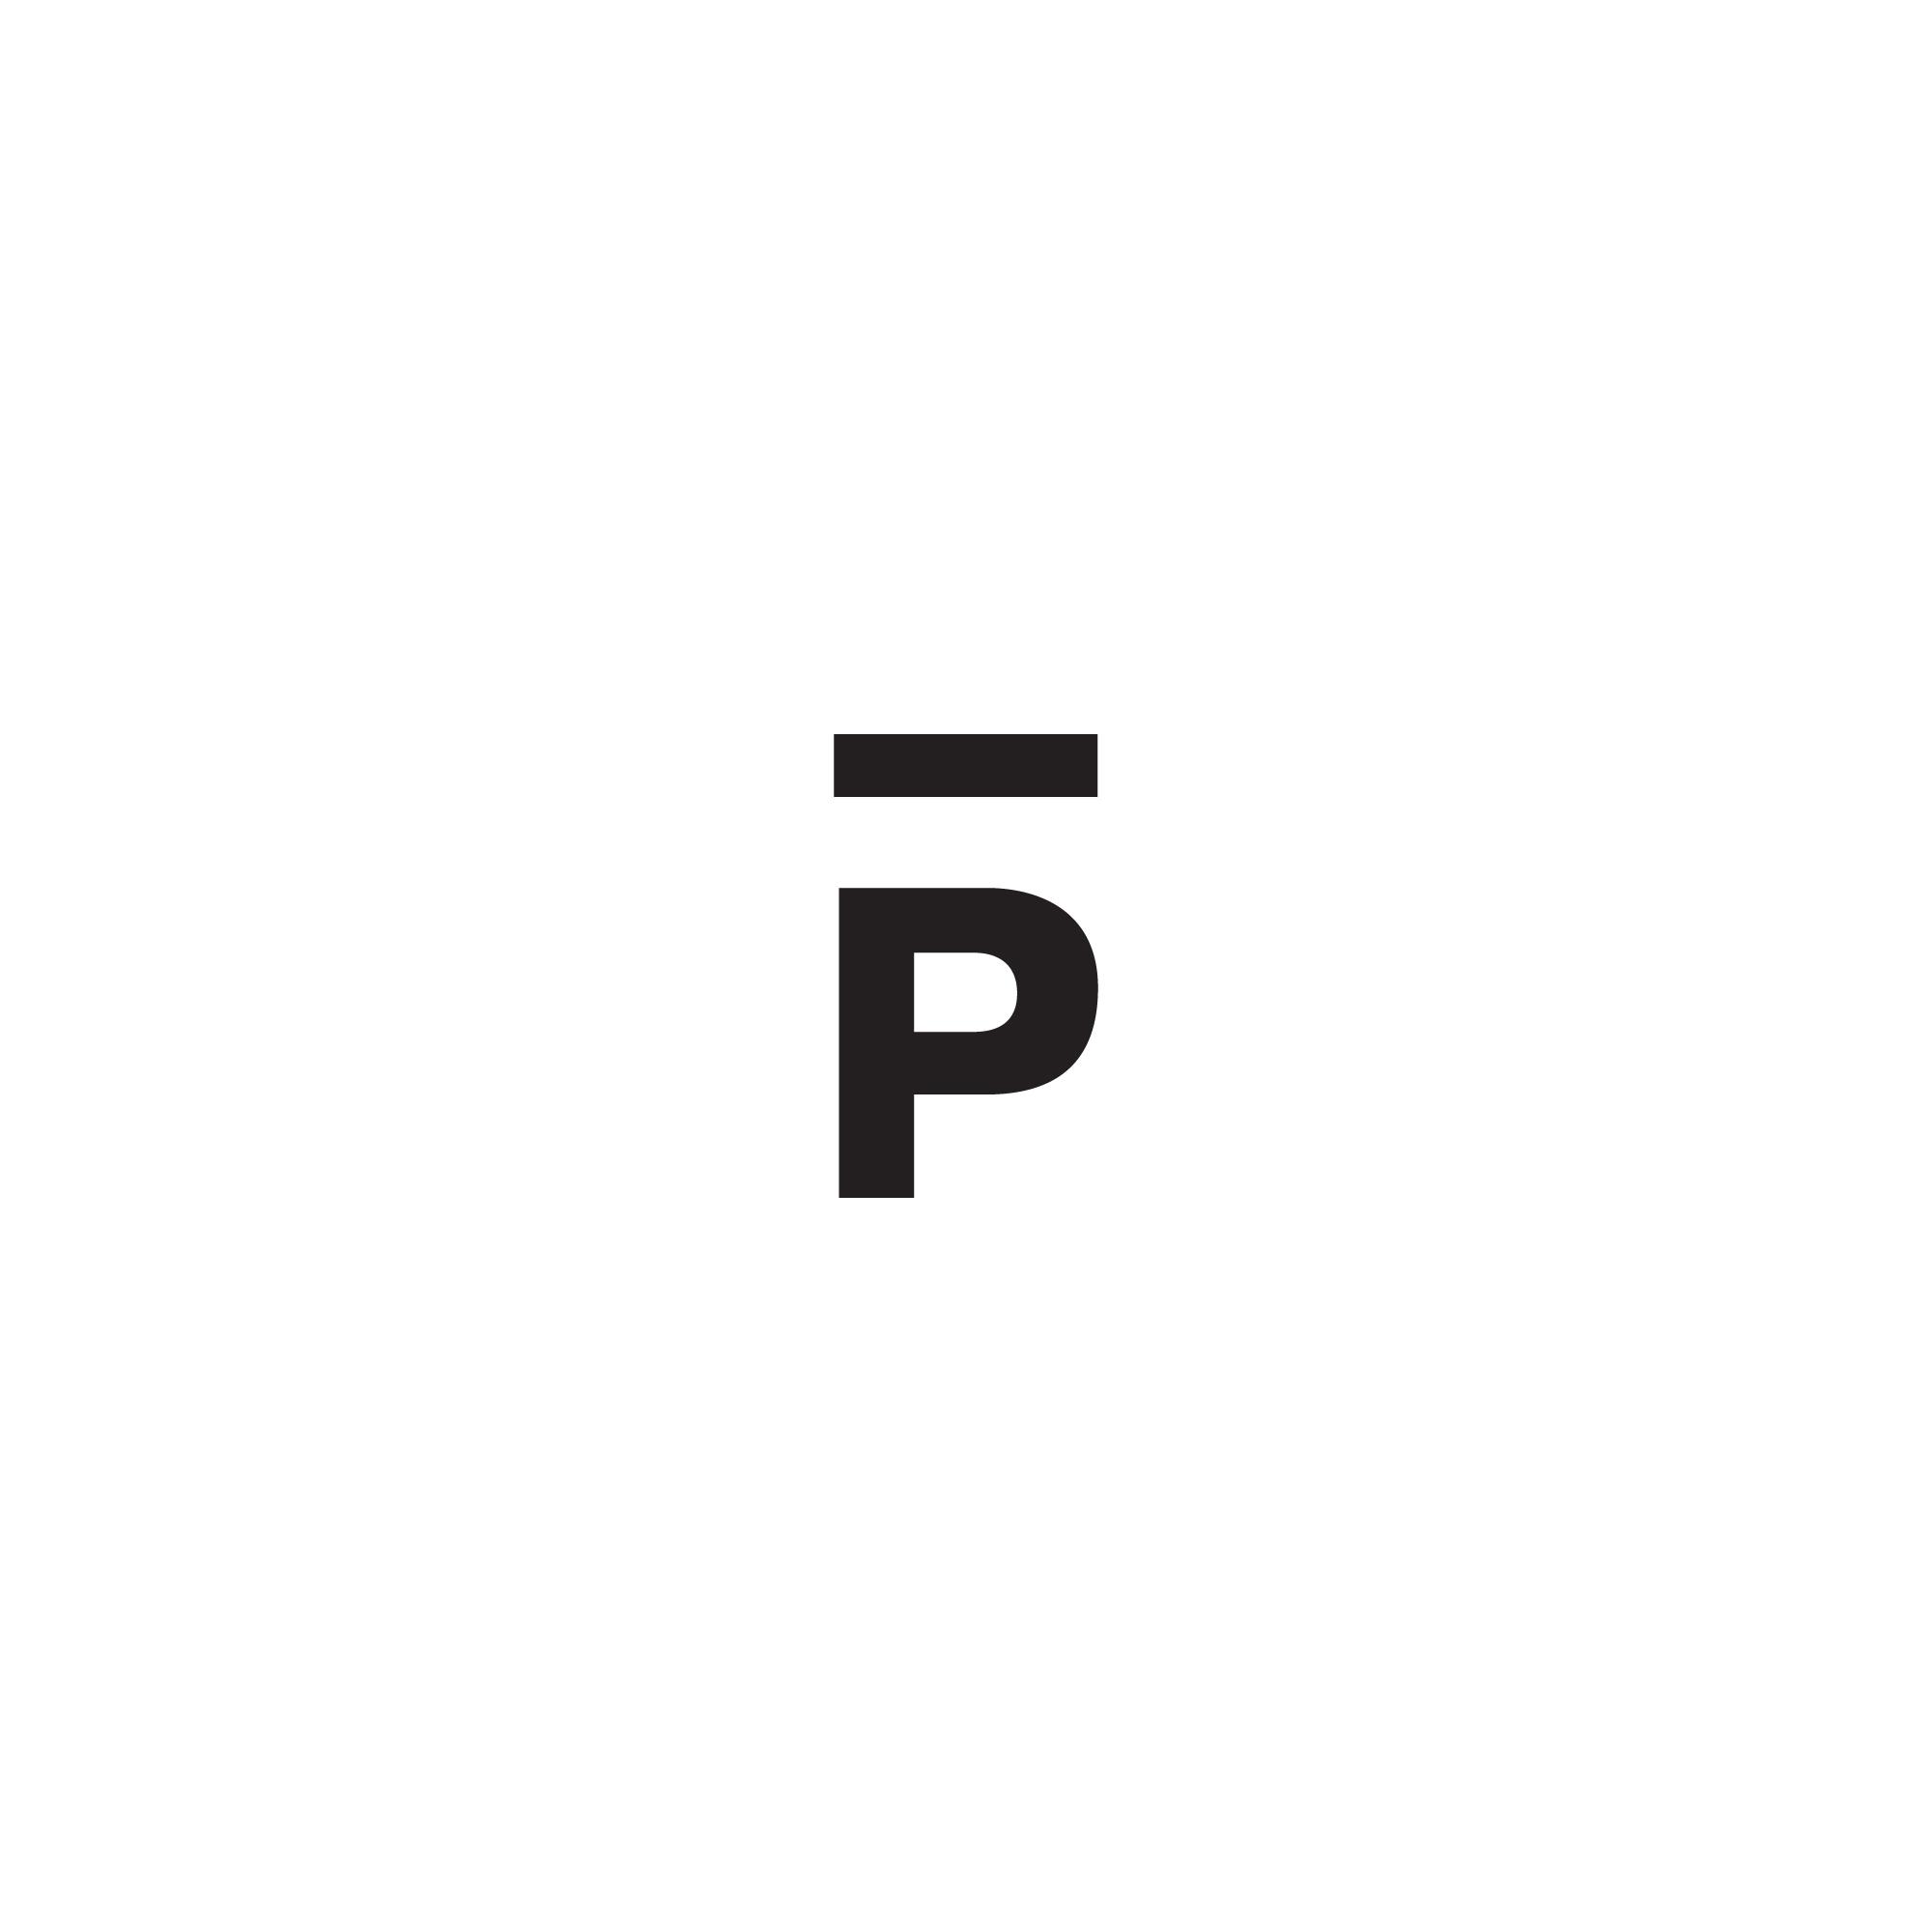 press-mark.jpg